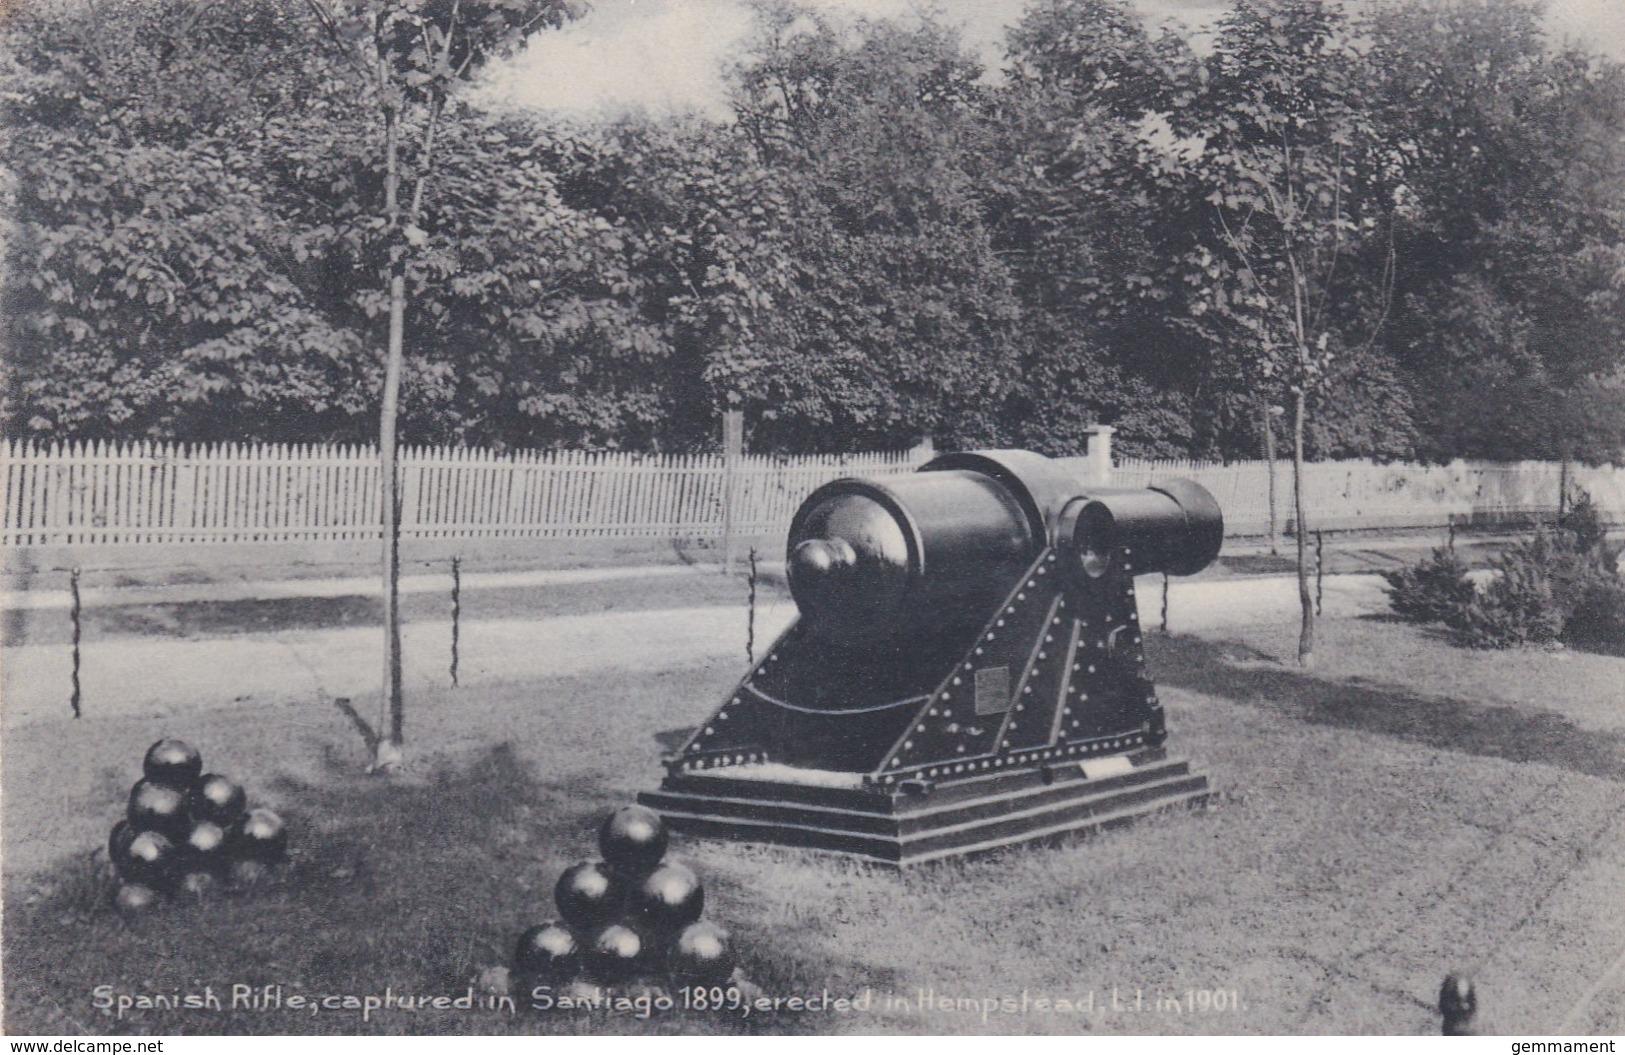 HAMPSTEAD - SPANISH RIFLE CAPTURED IN 1899 AT SANTIAGO - London Suburbs